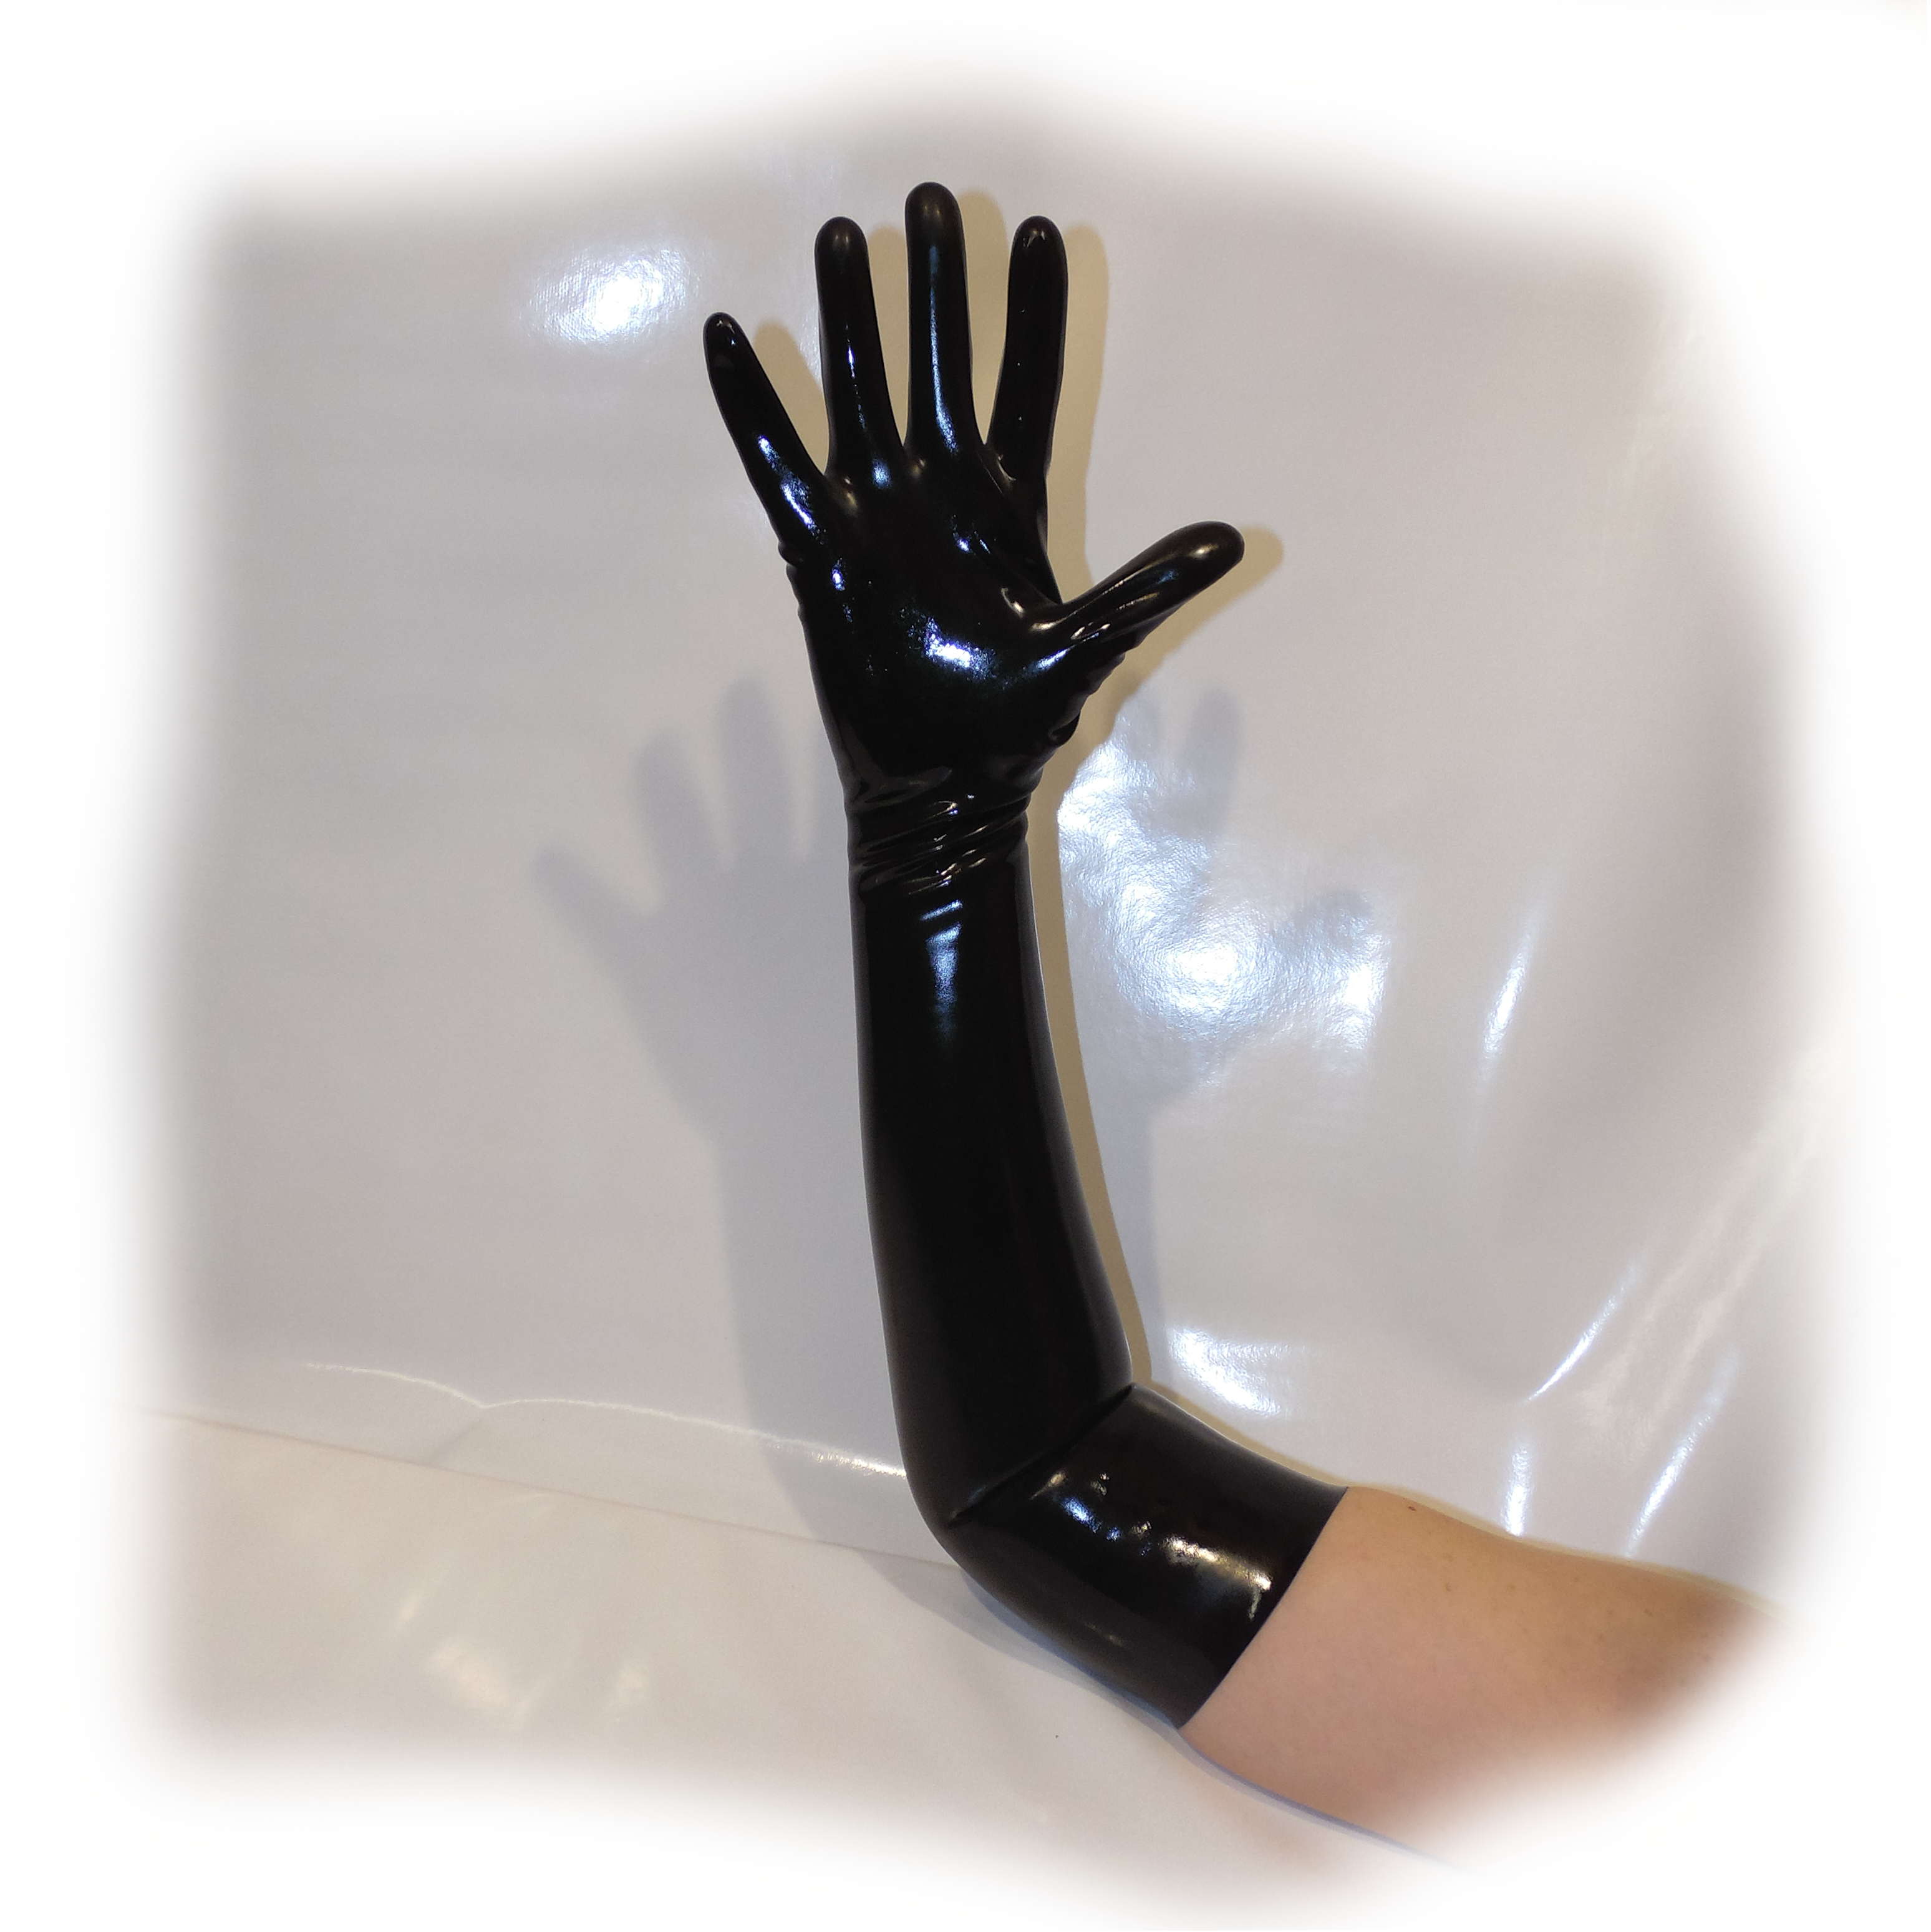 Latex Glove Schwarz extra heiß - 0,3 mm starkes Materia Size M (2015)